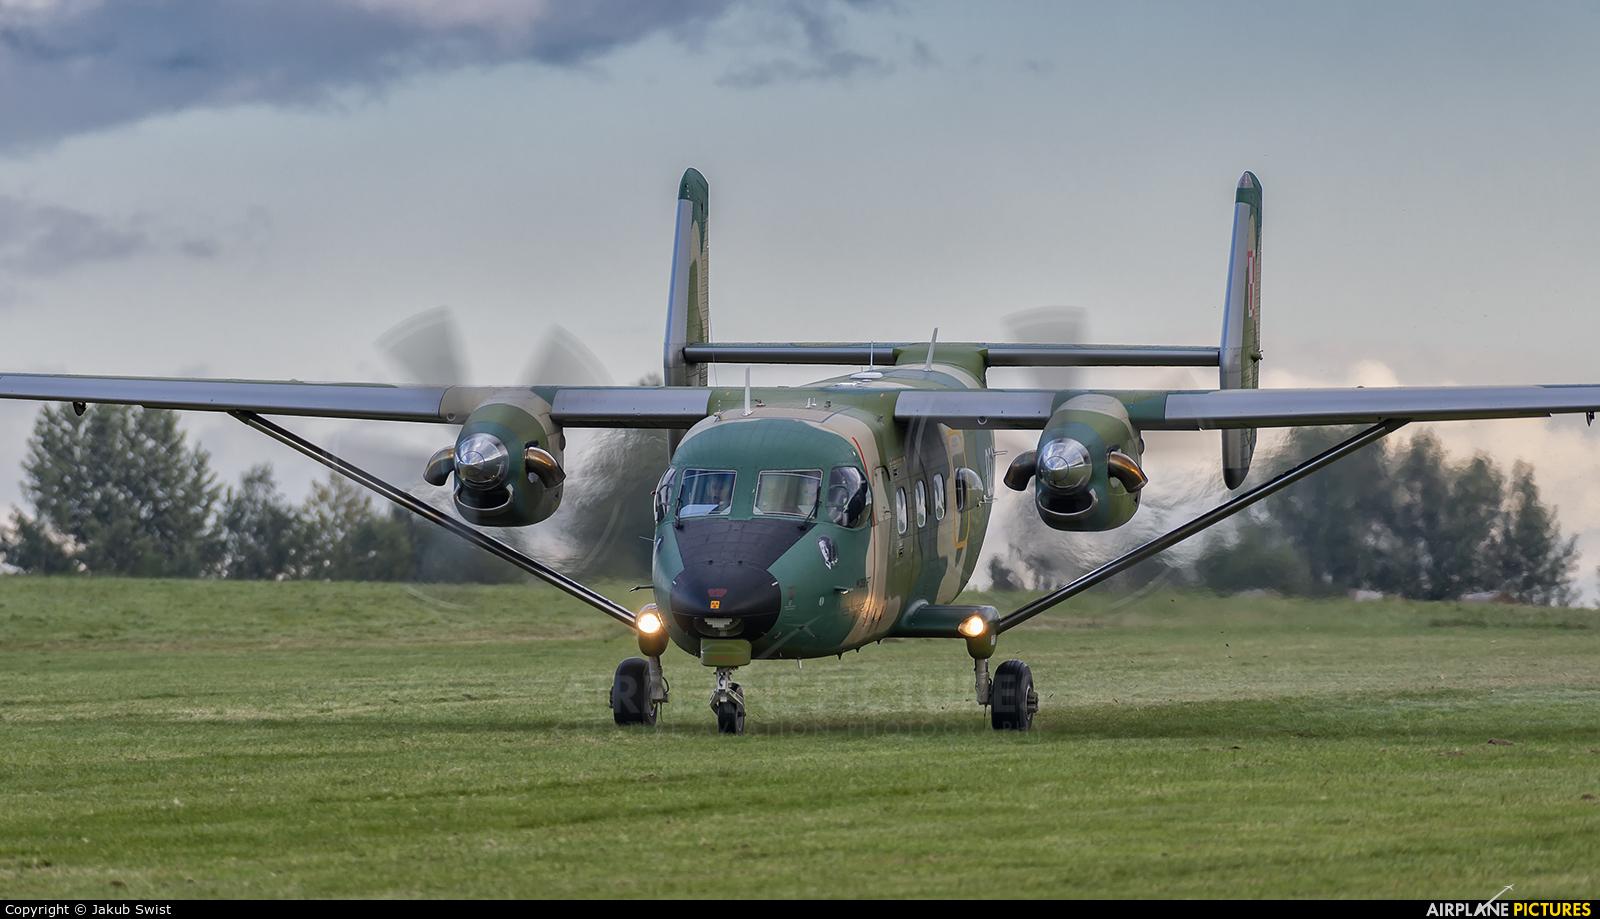 Poland - Air Force 0220 aircraft at Nowy Targ